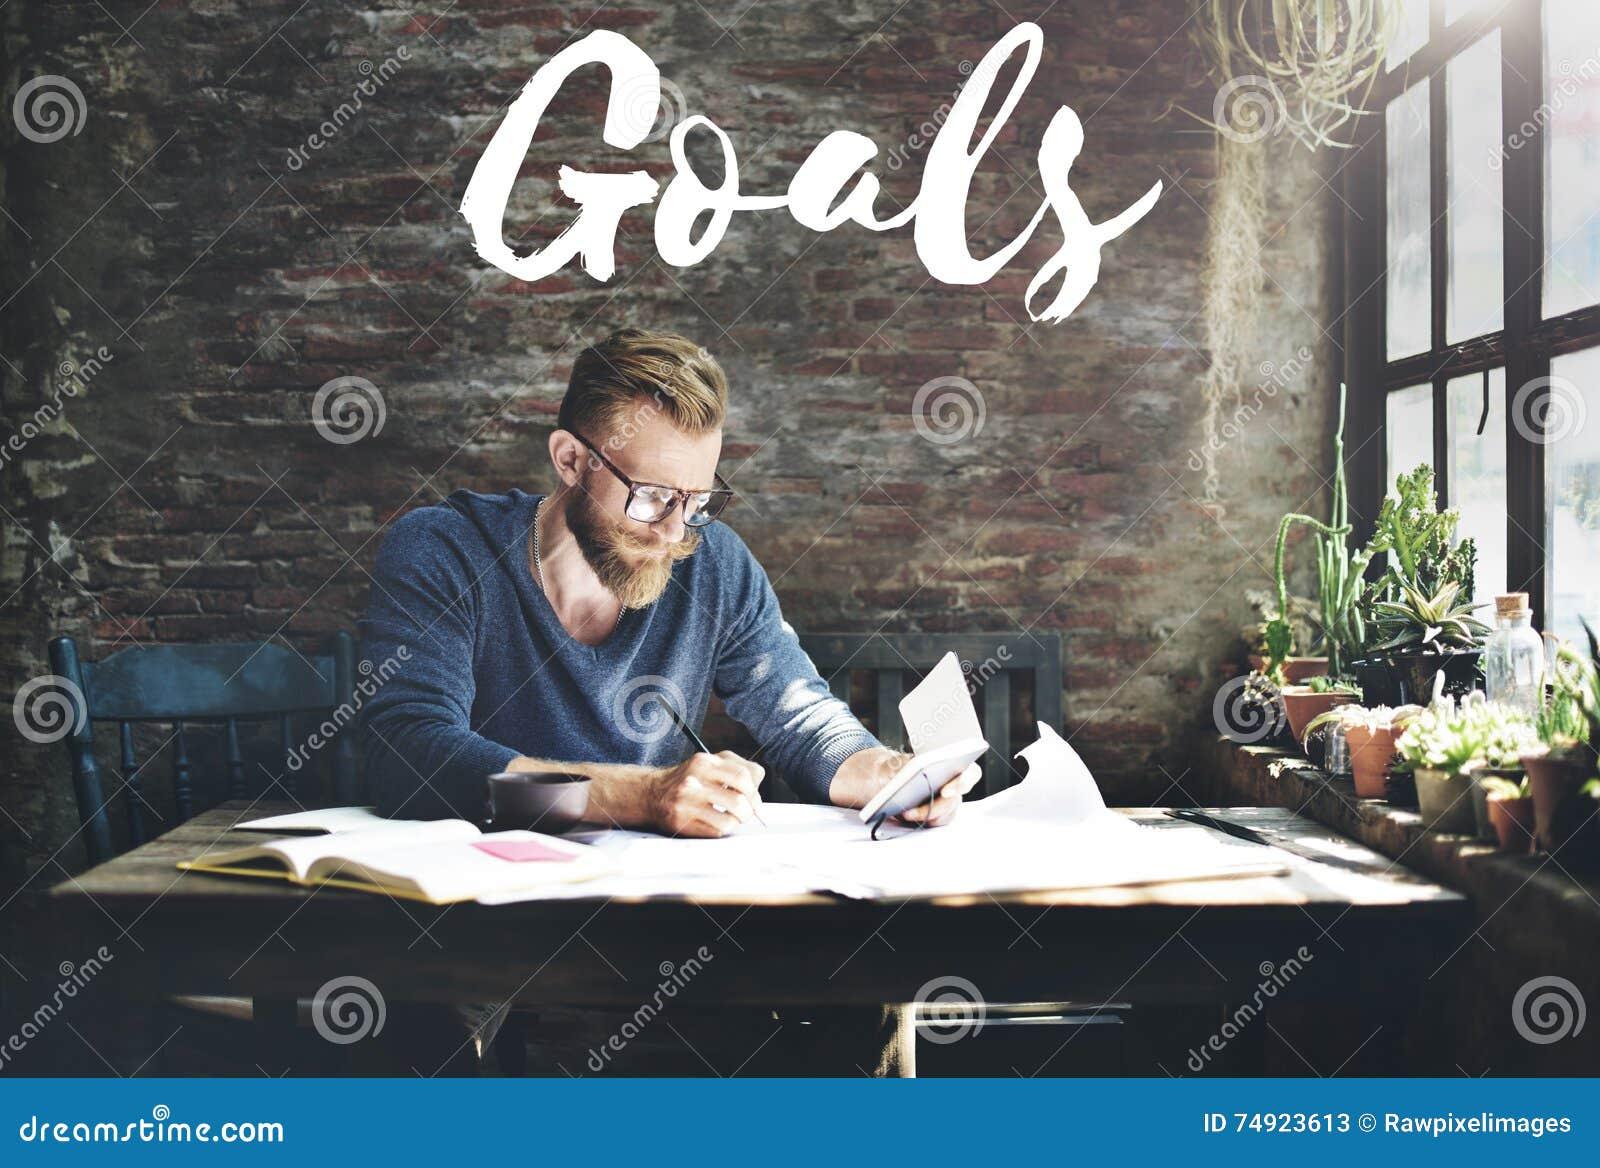 Ziel-Ziel-Ziel-Visions-Motivations-Aspirations-Konzept